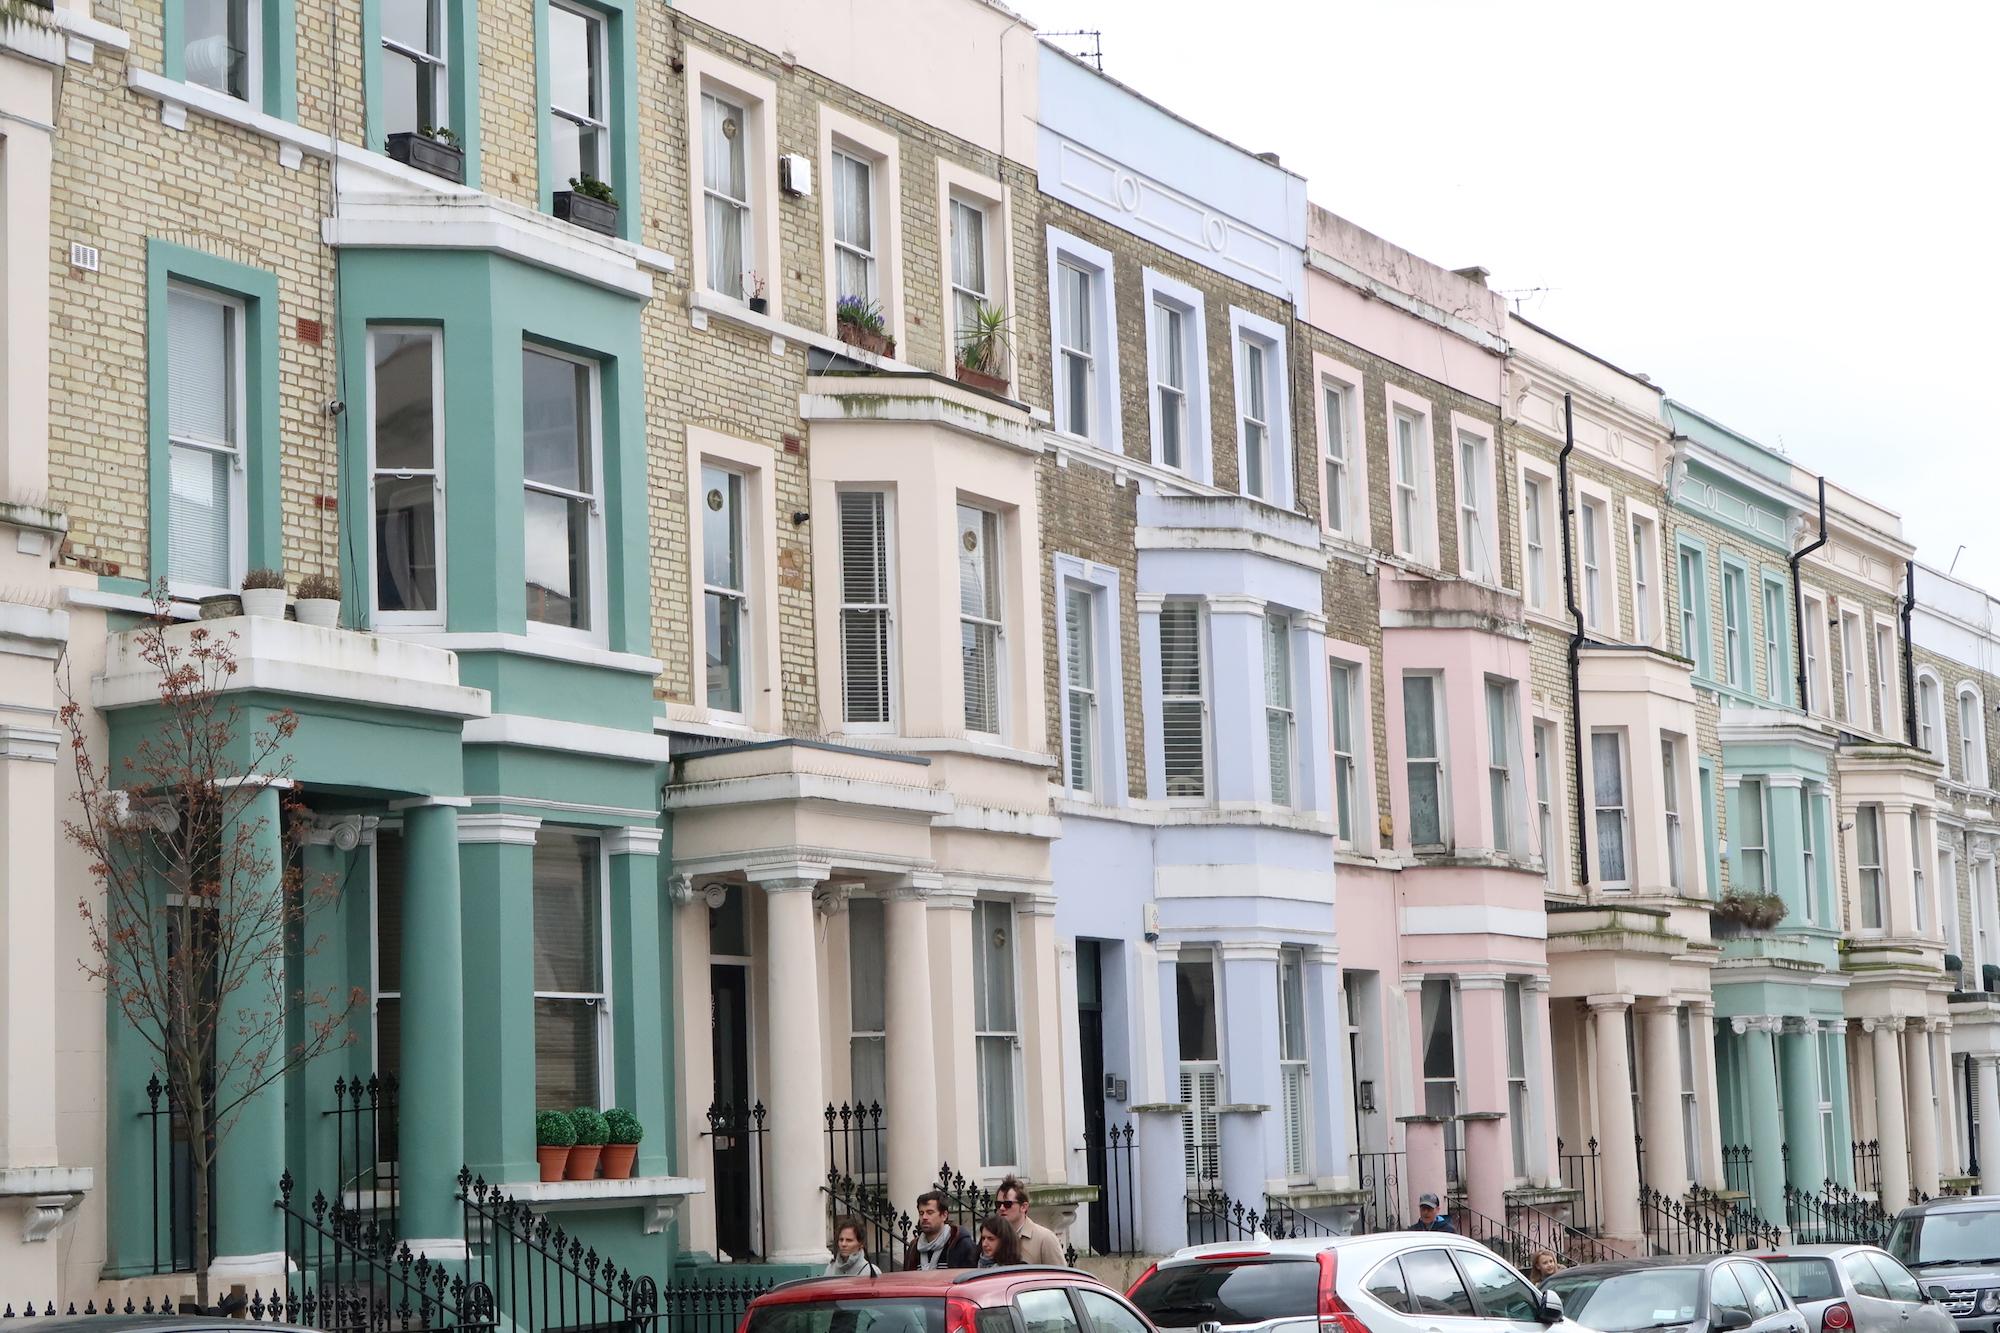 notting hill kolorowe domy